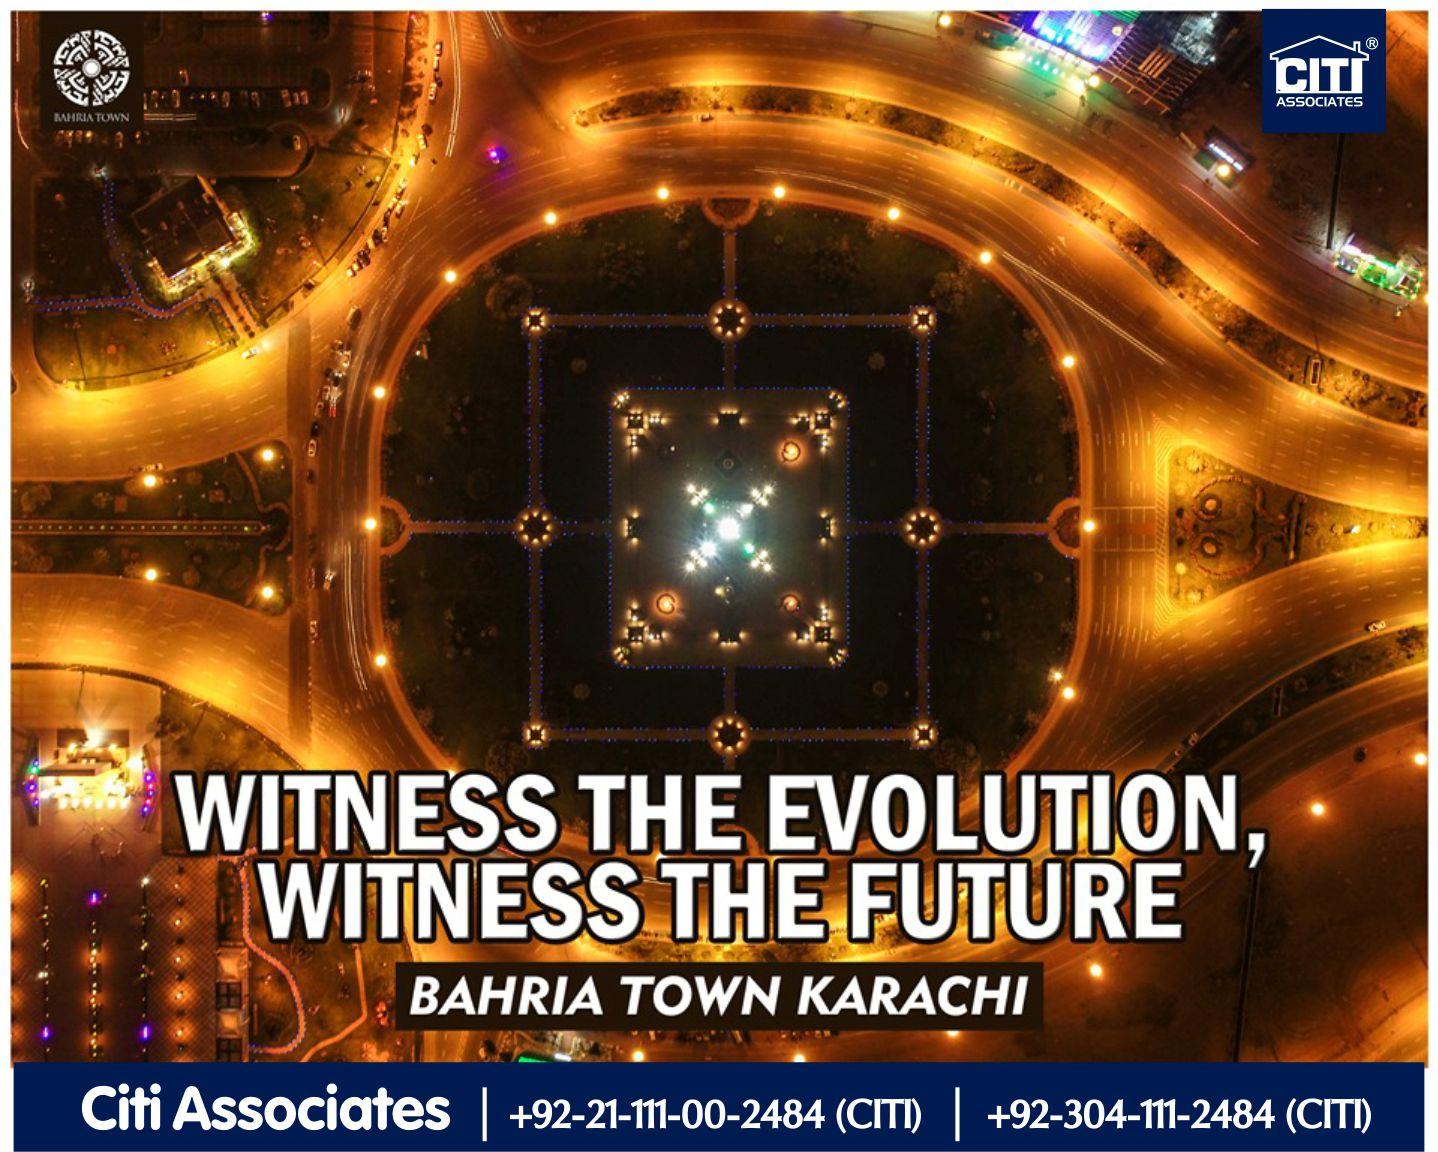 Witness the Evolution. Witness the Future | Bahria Town Karachi